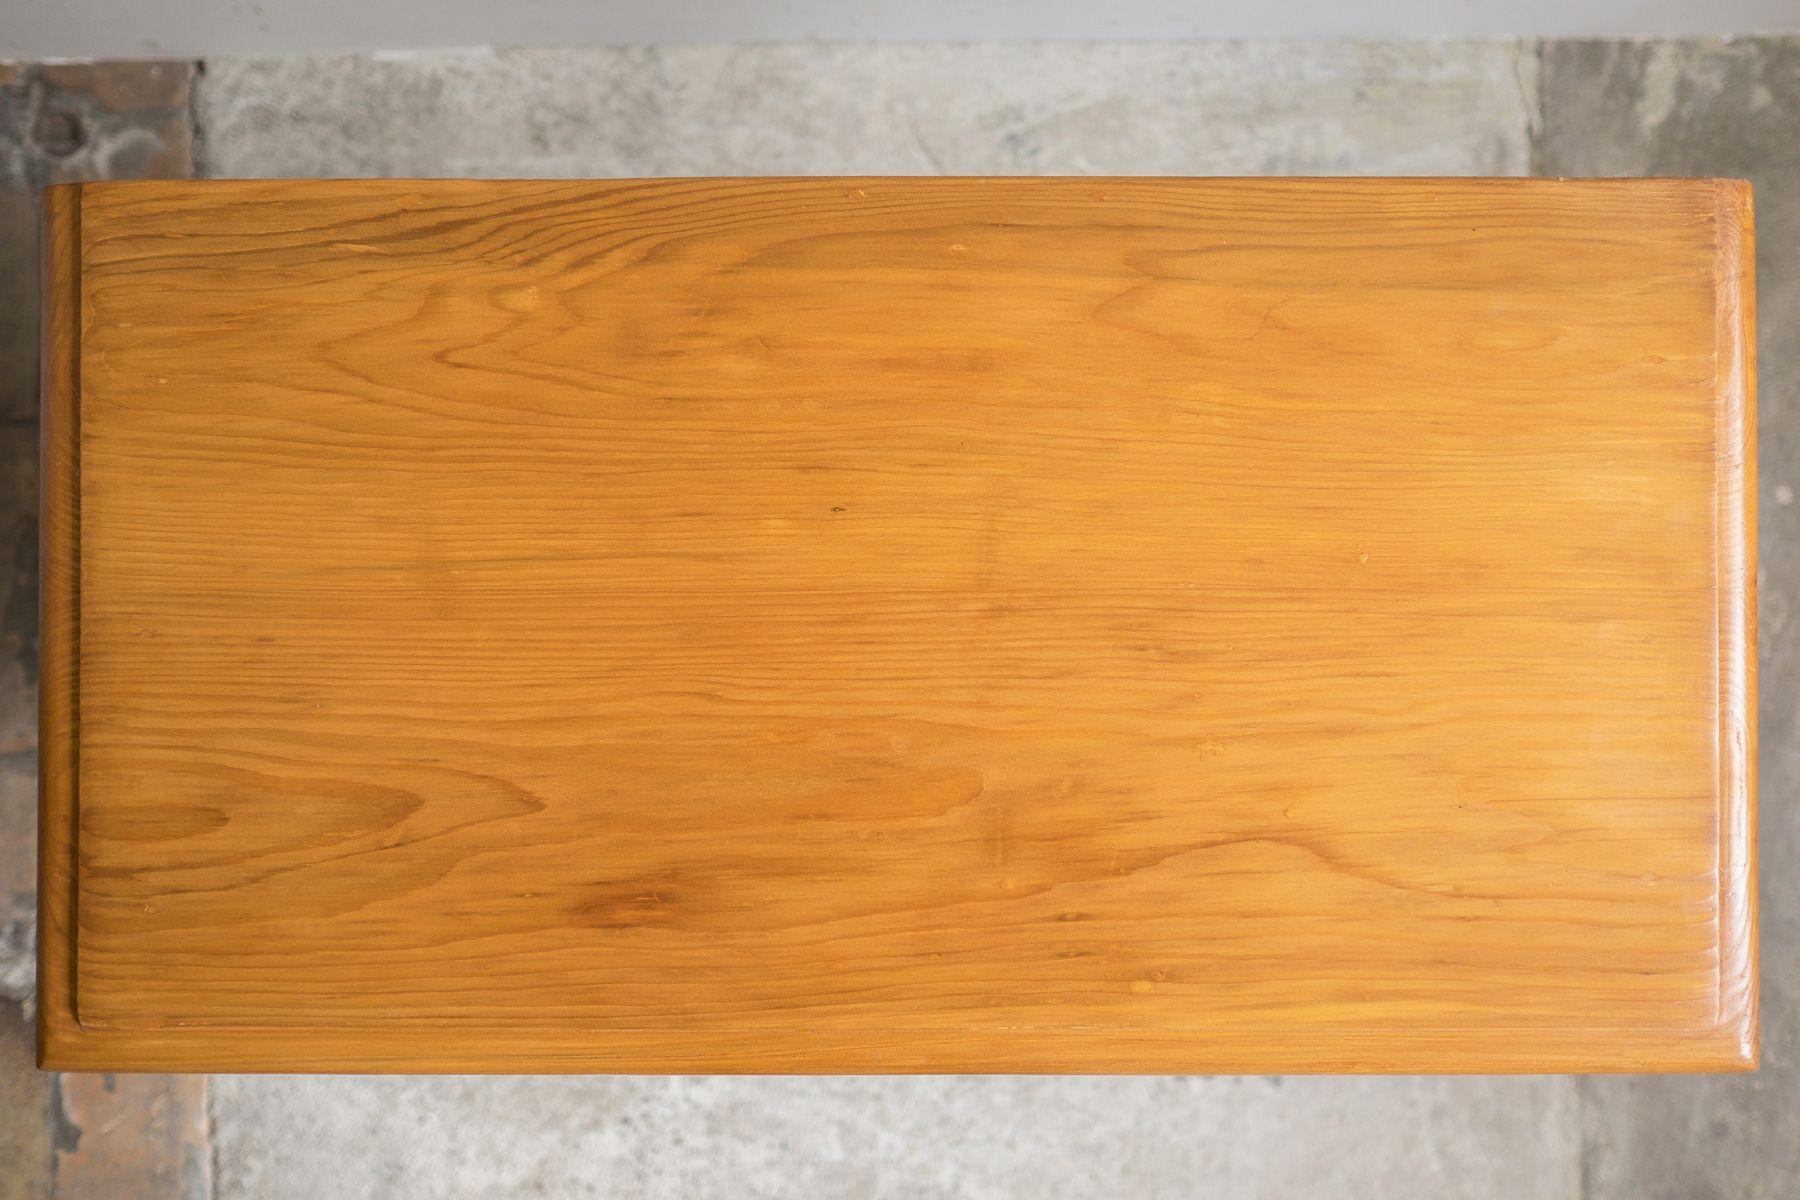 88000 chf - Designer Kommoden Aus Holz Antike